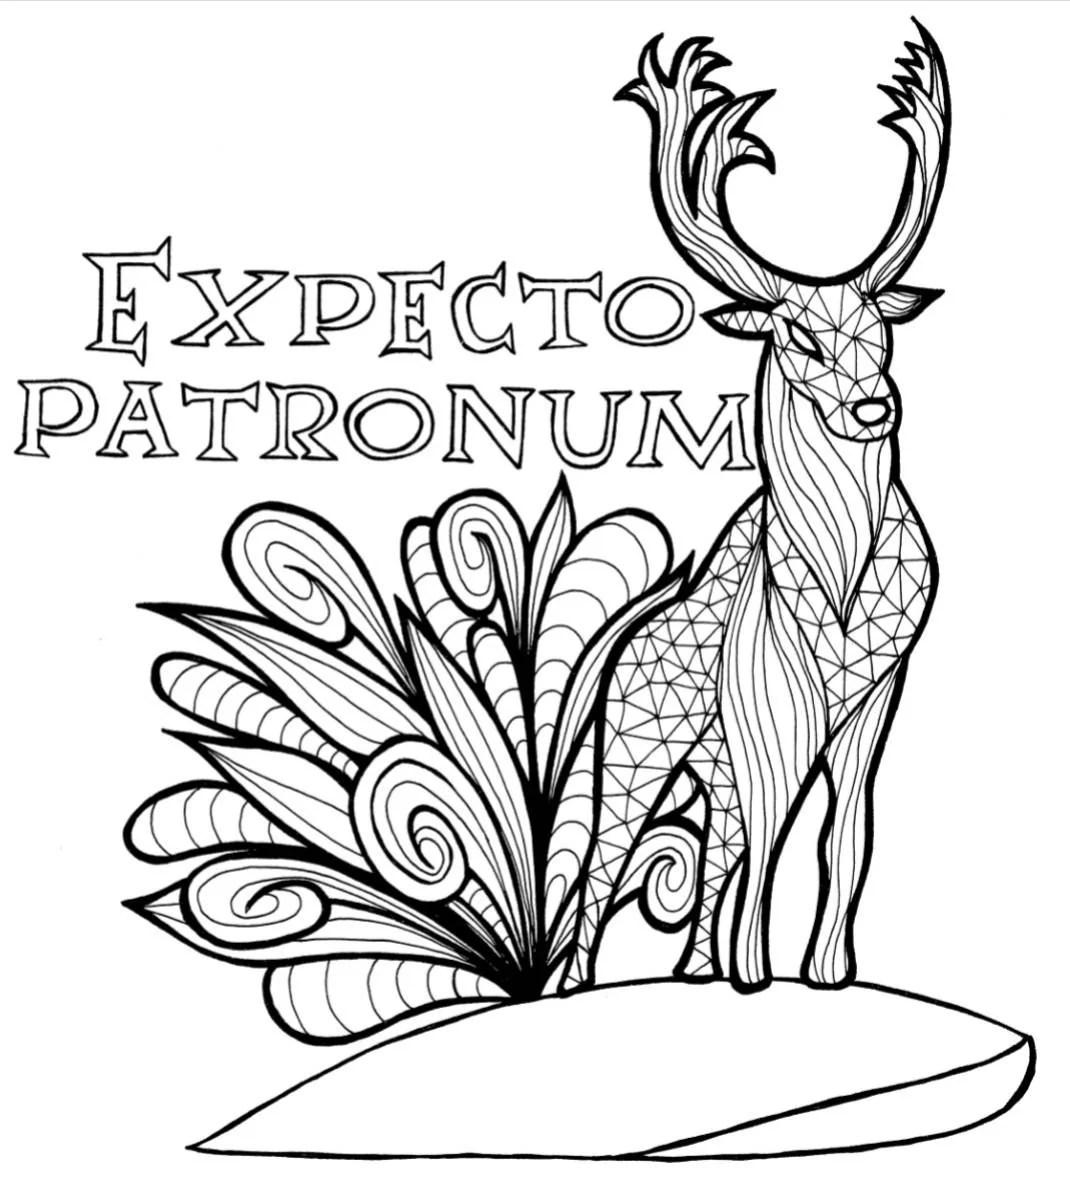 Harry Potter Patronum Coloring Page